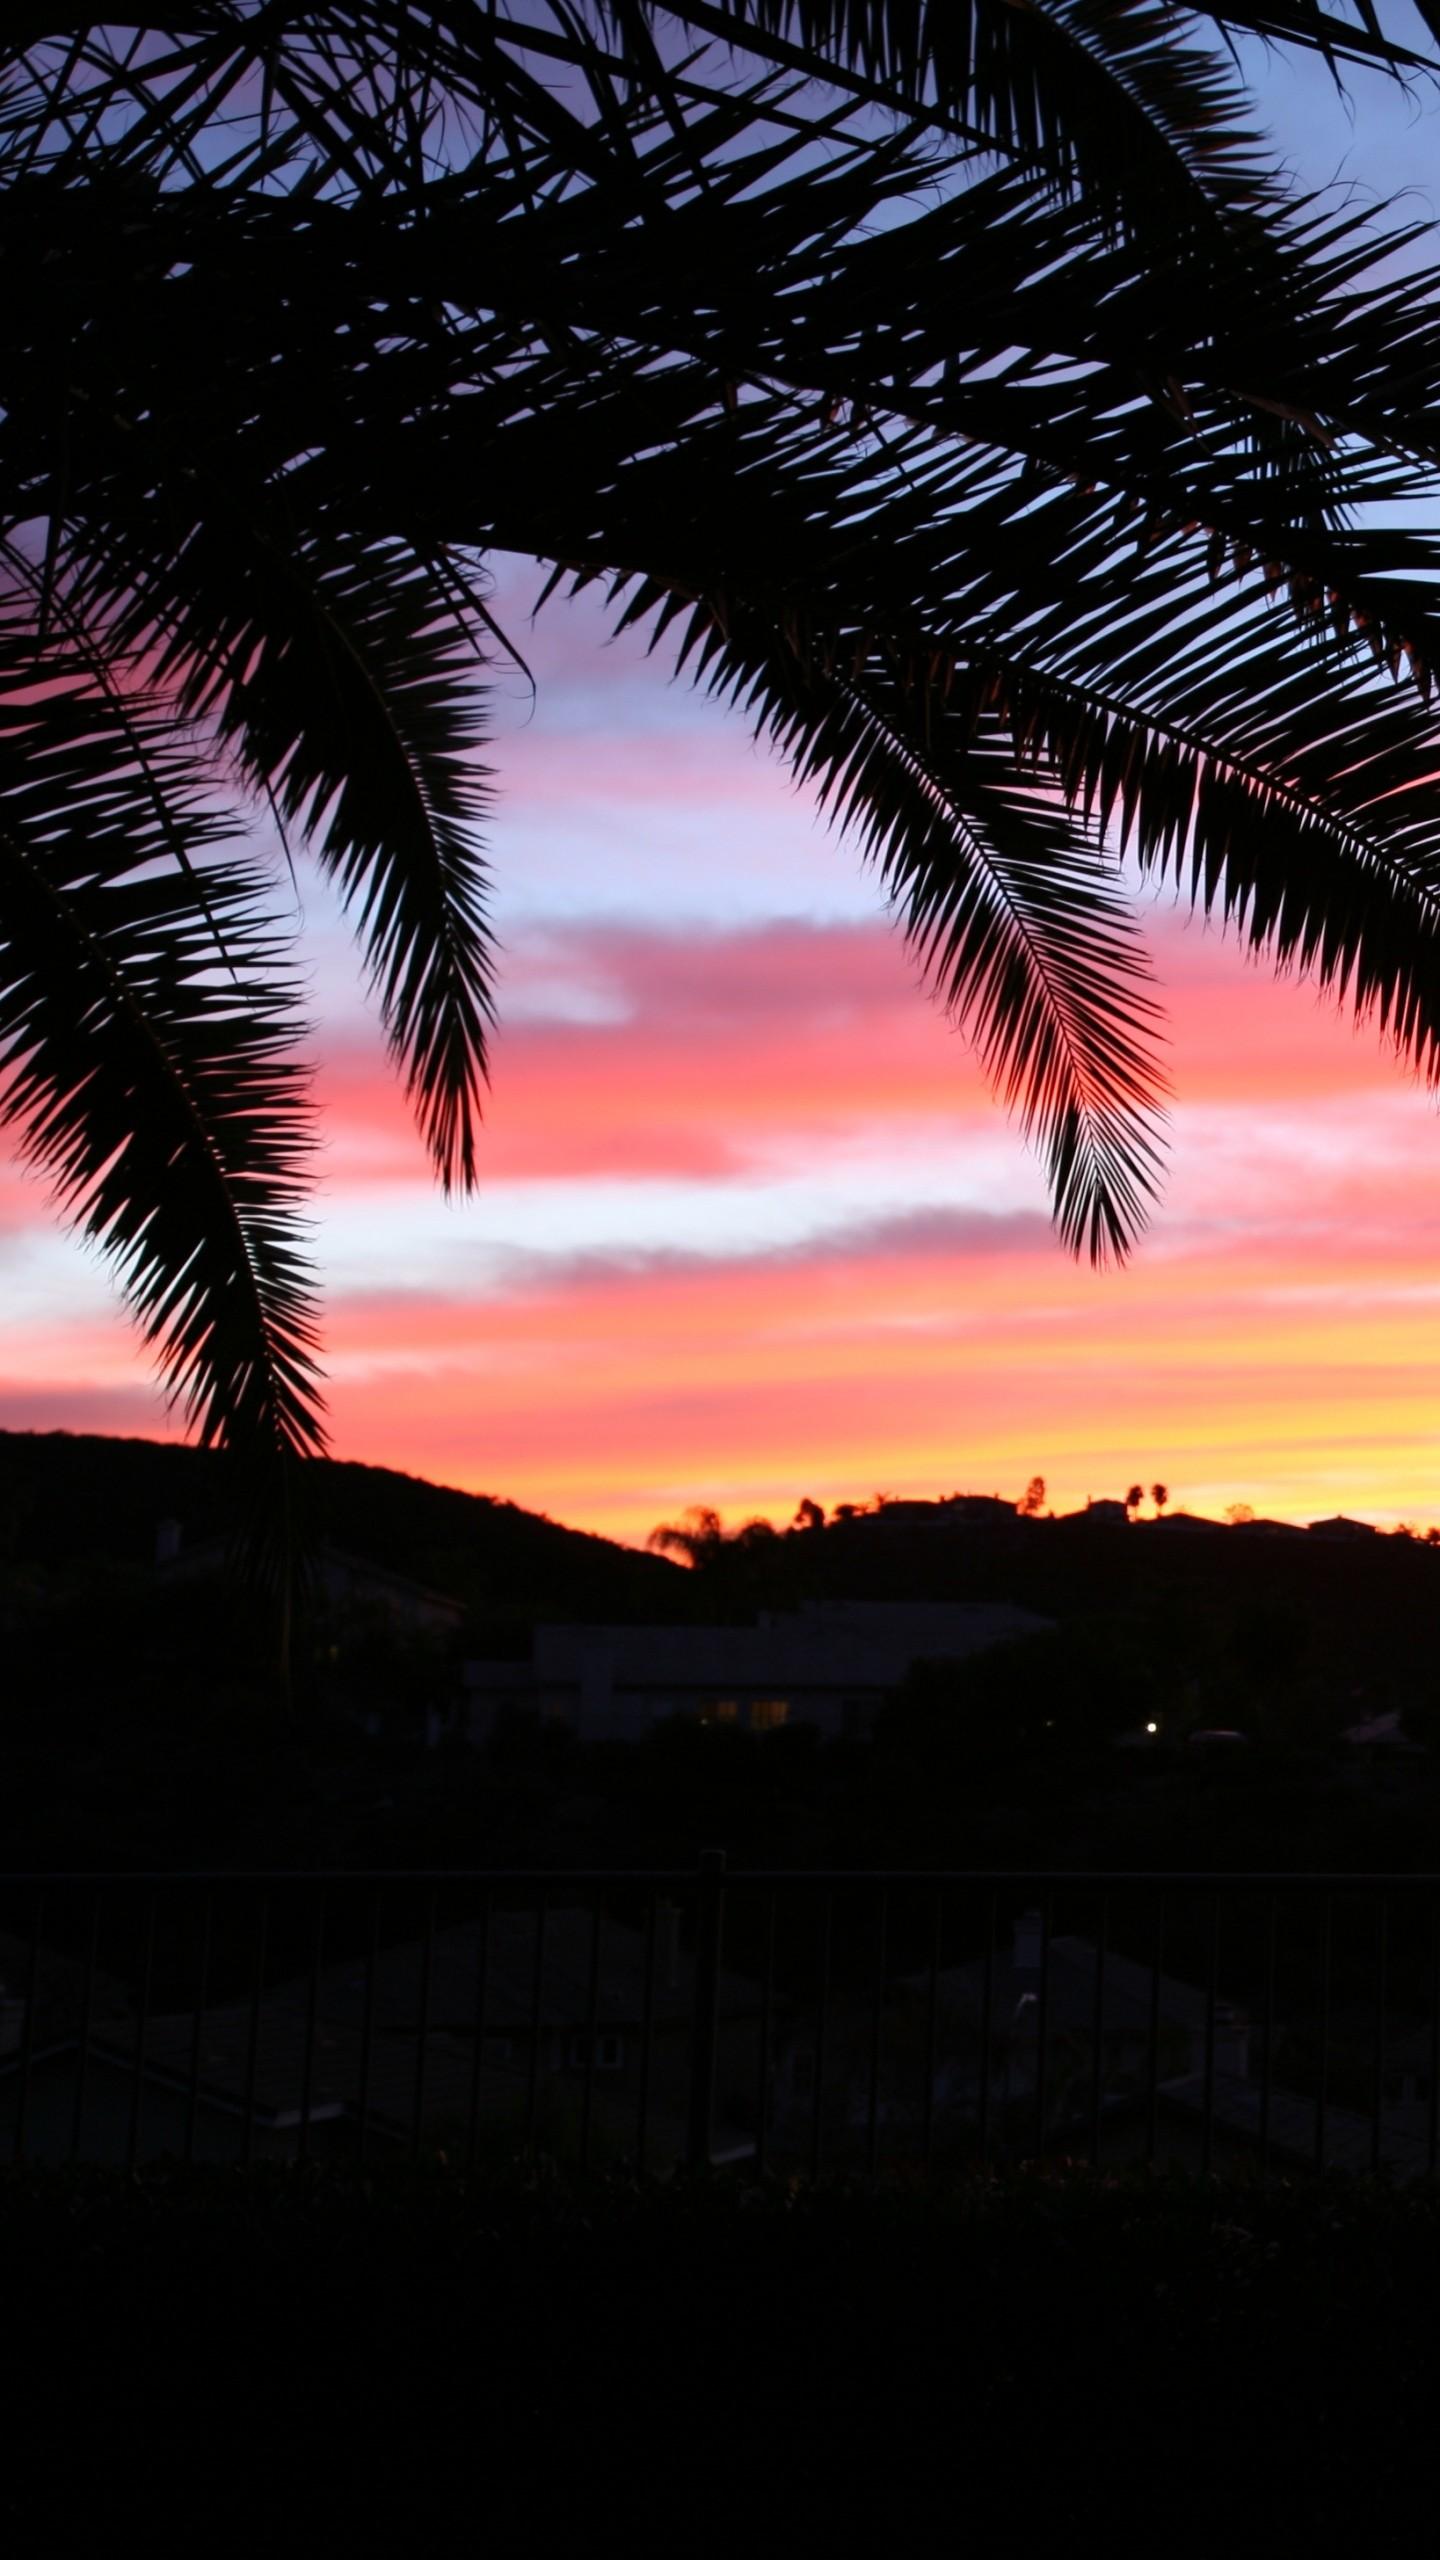 Wallpaper Palm Tree, Sky, Sunset   Data-src - 4k Palm Trees Background - HD Wallpaper